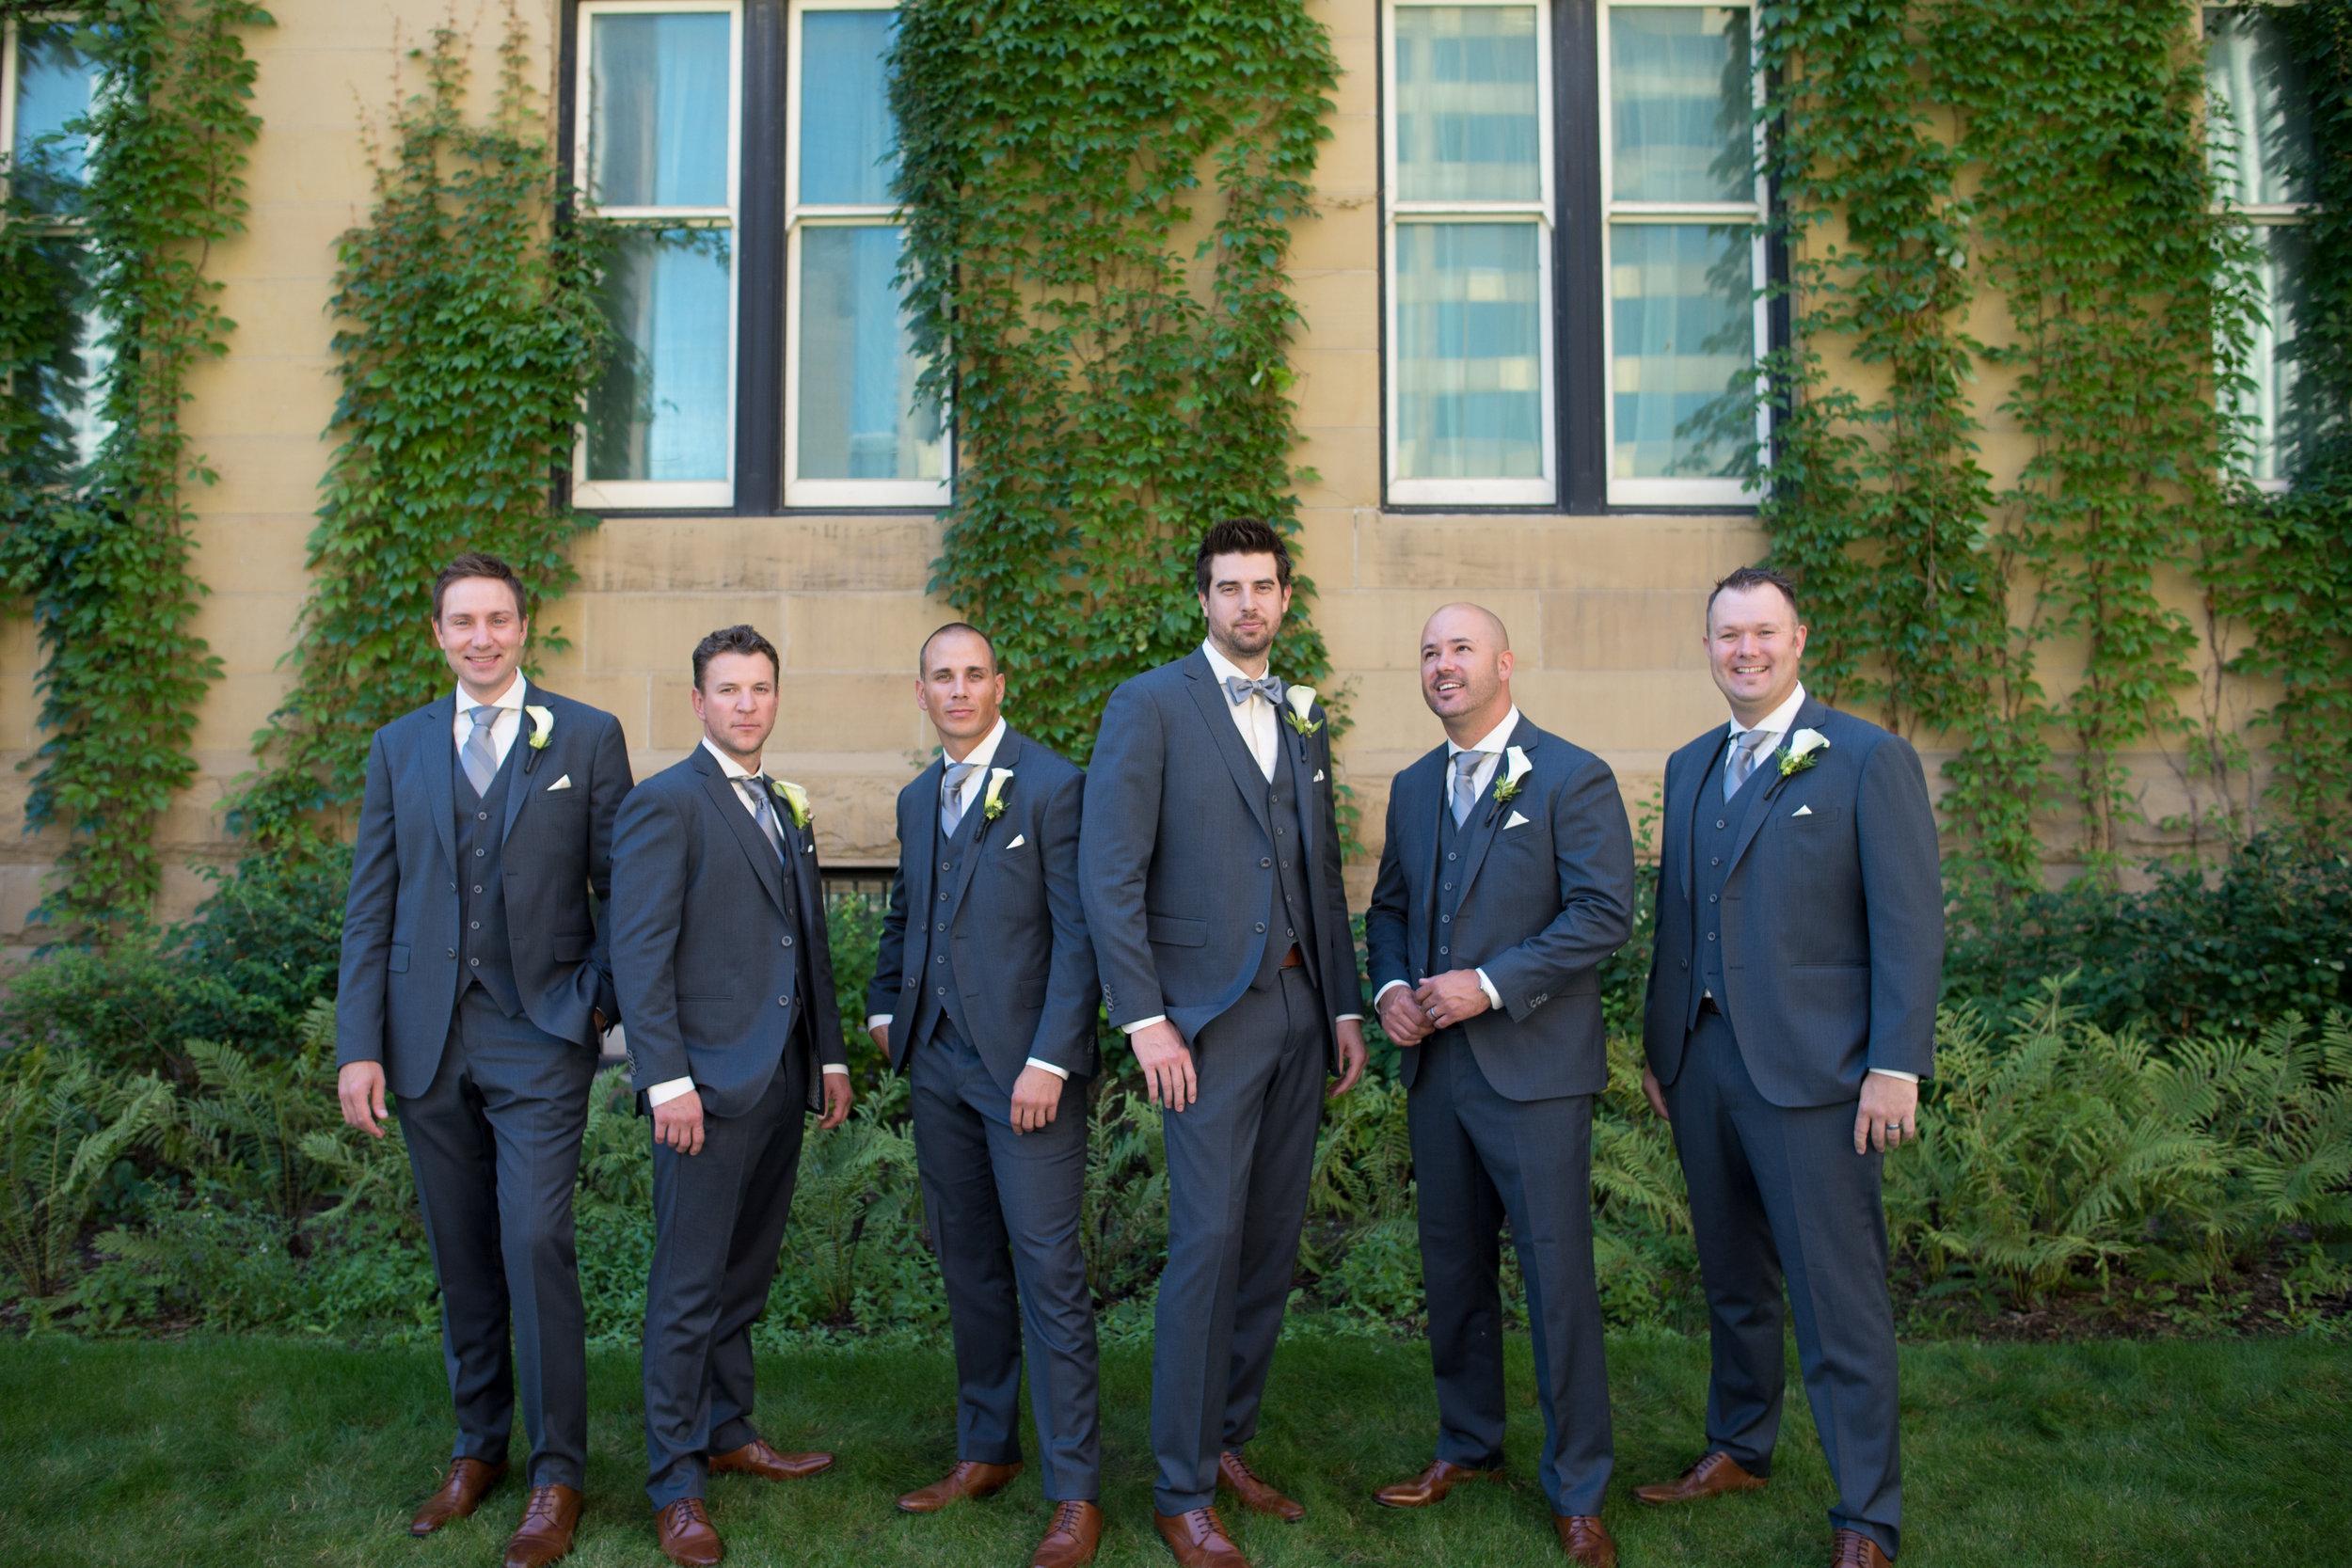 Calgary_Wedding_Photographer_Sanja_Scott_2016_HR 0270.jpg